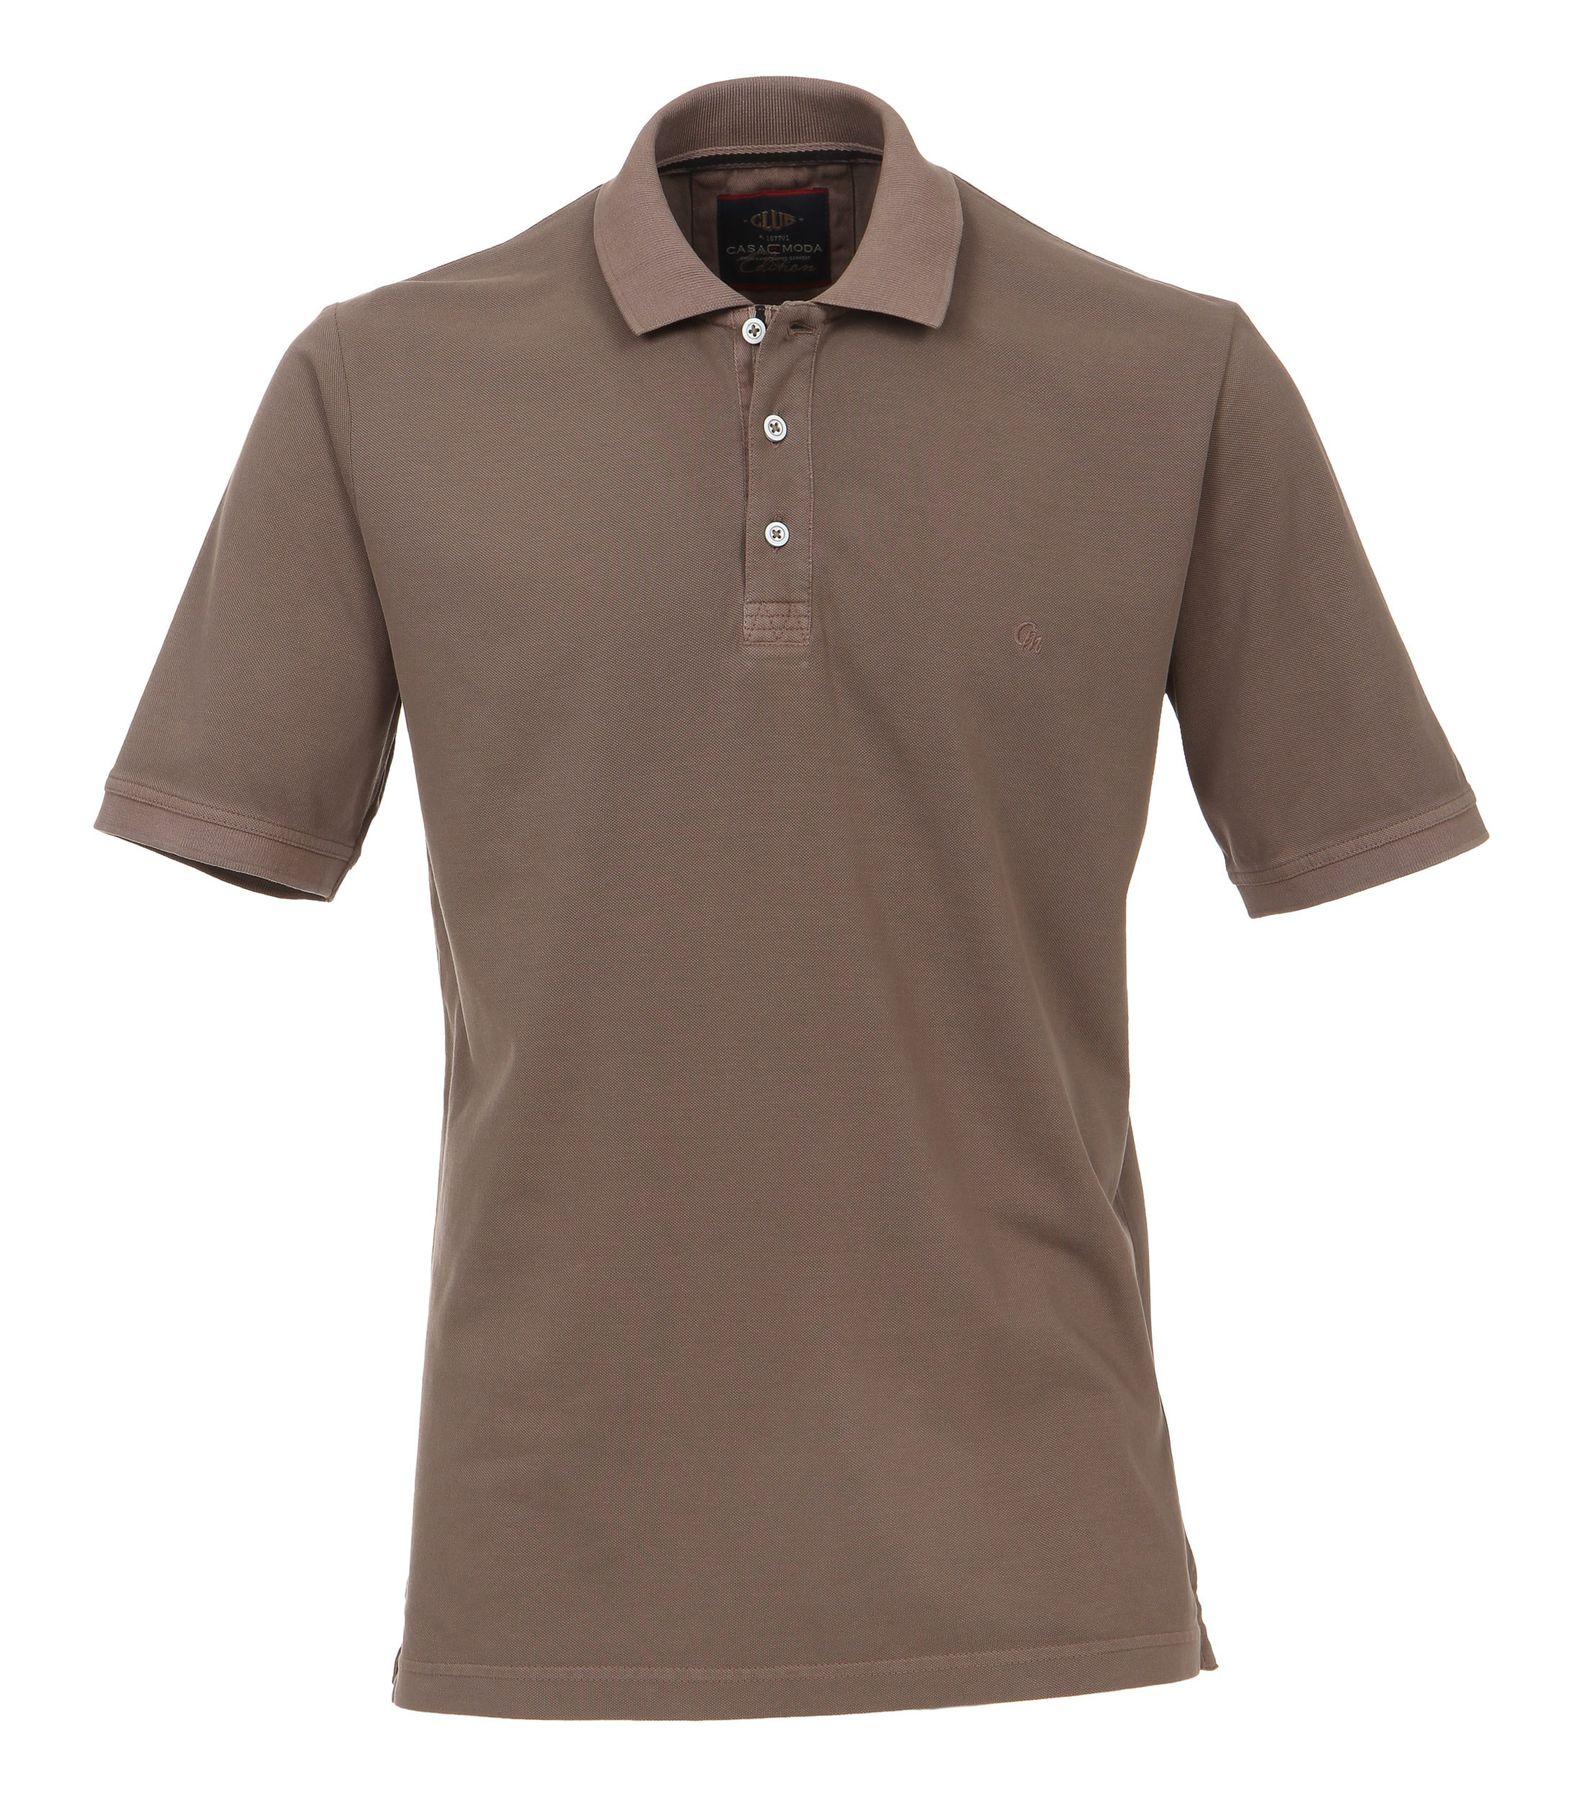 Casa Moda - Herren Polo-Shirt in verschiedenen Farben S-6XL (952137100) – Bild 6